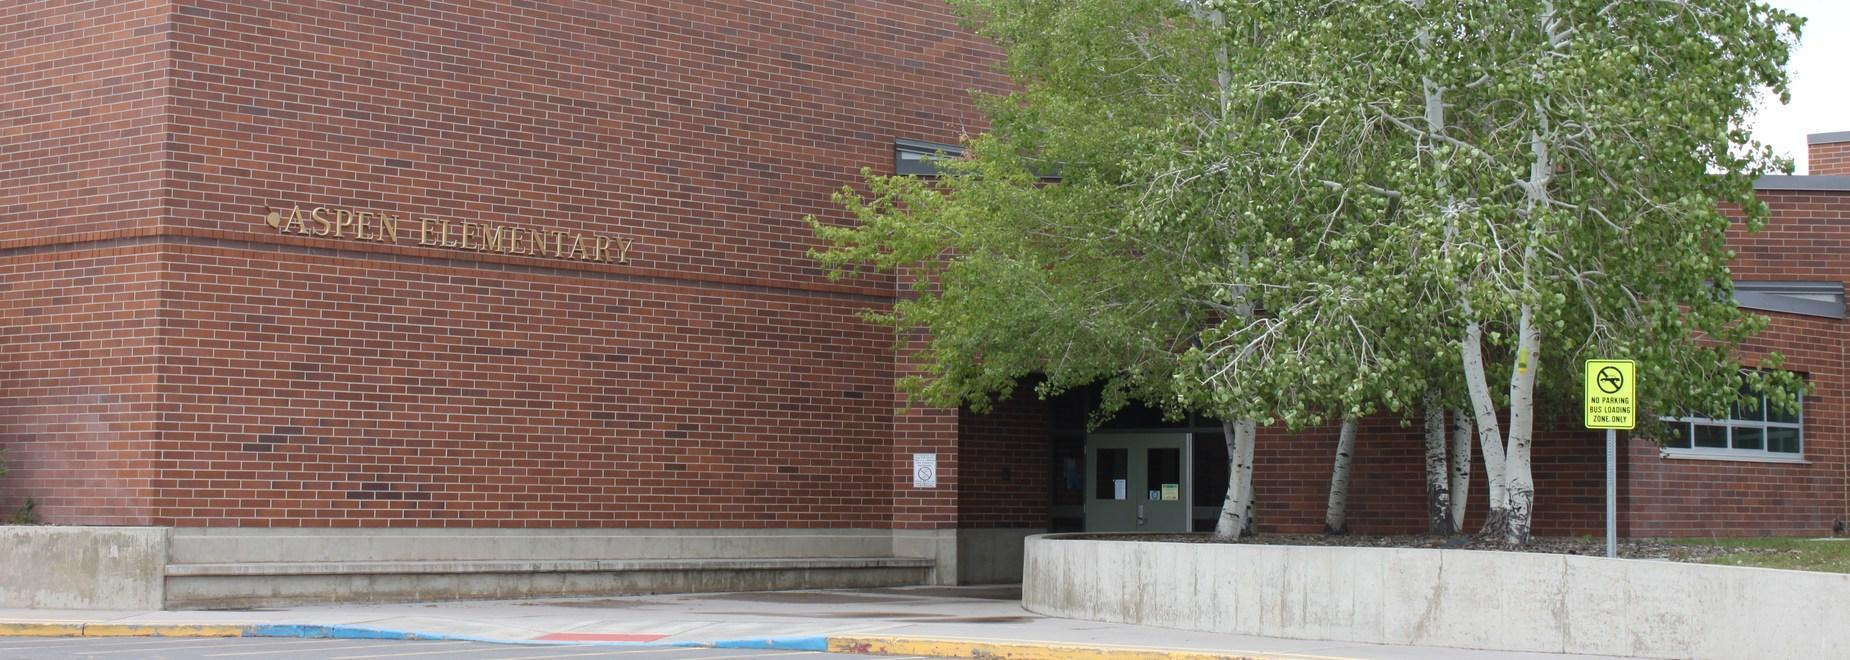 Entrance of Aspen Elementary